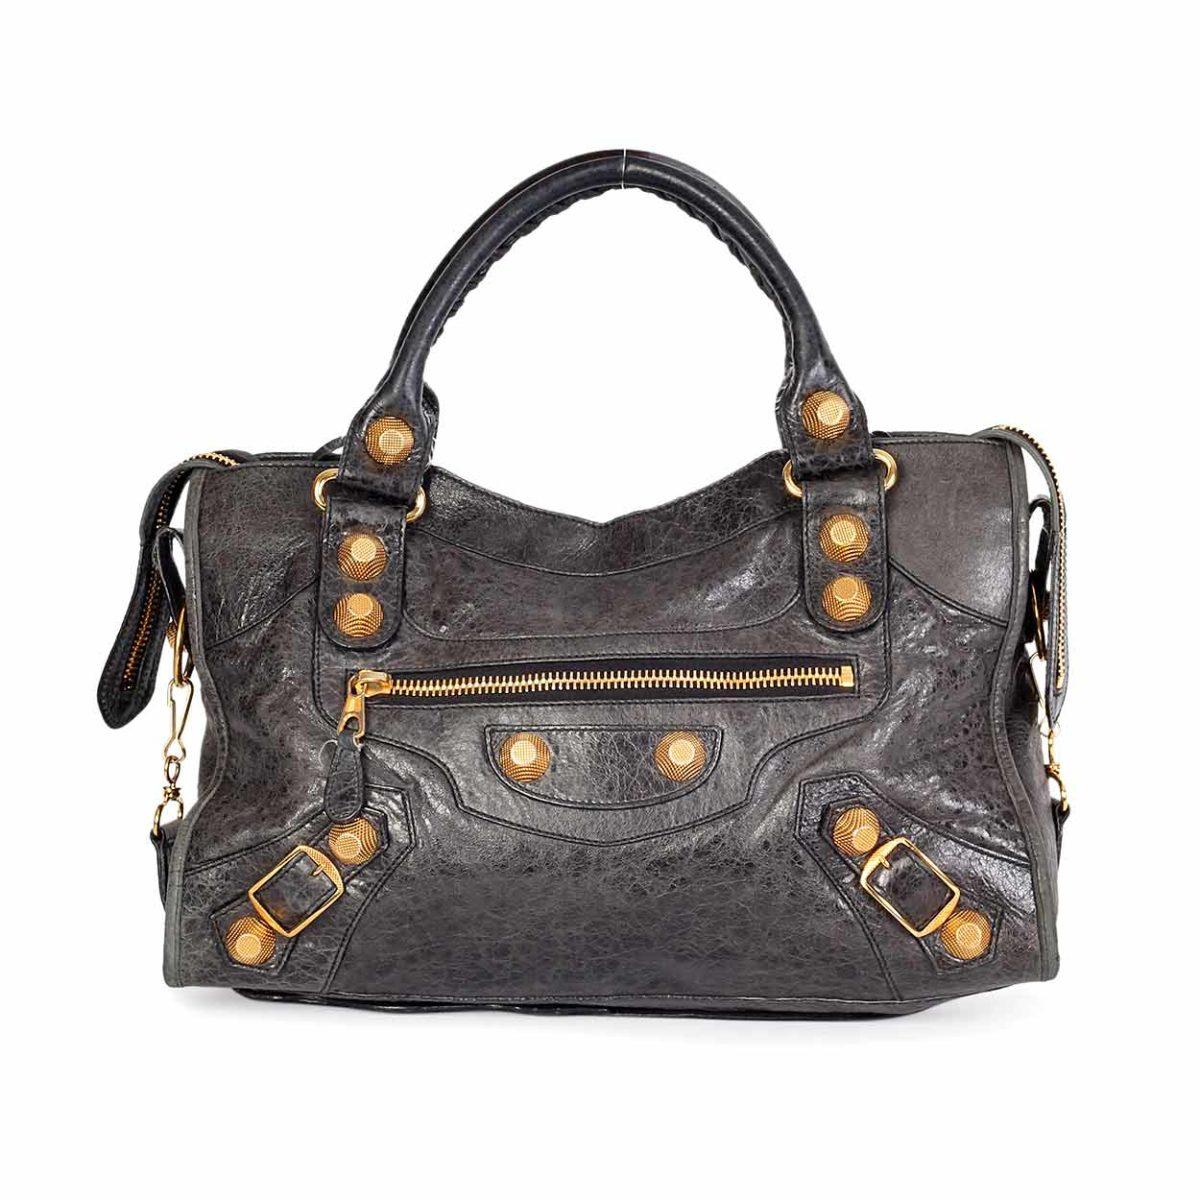 ccb6b22cab BALENCIAGA Giant City Bag   Luxity